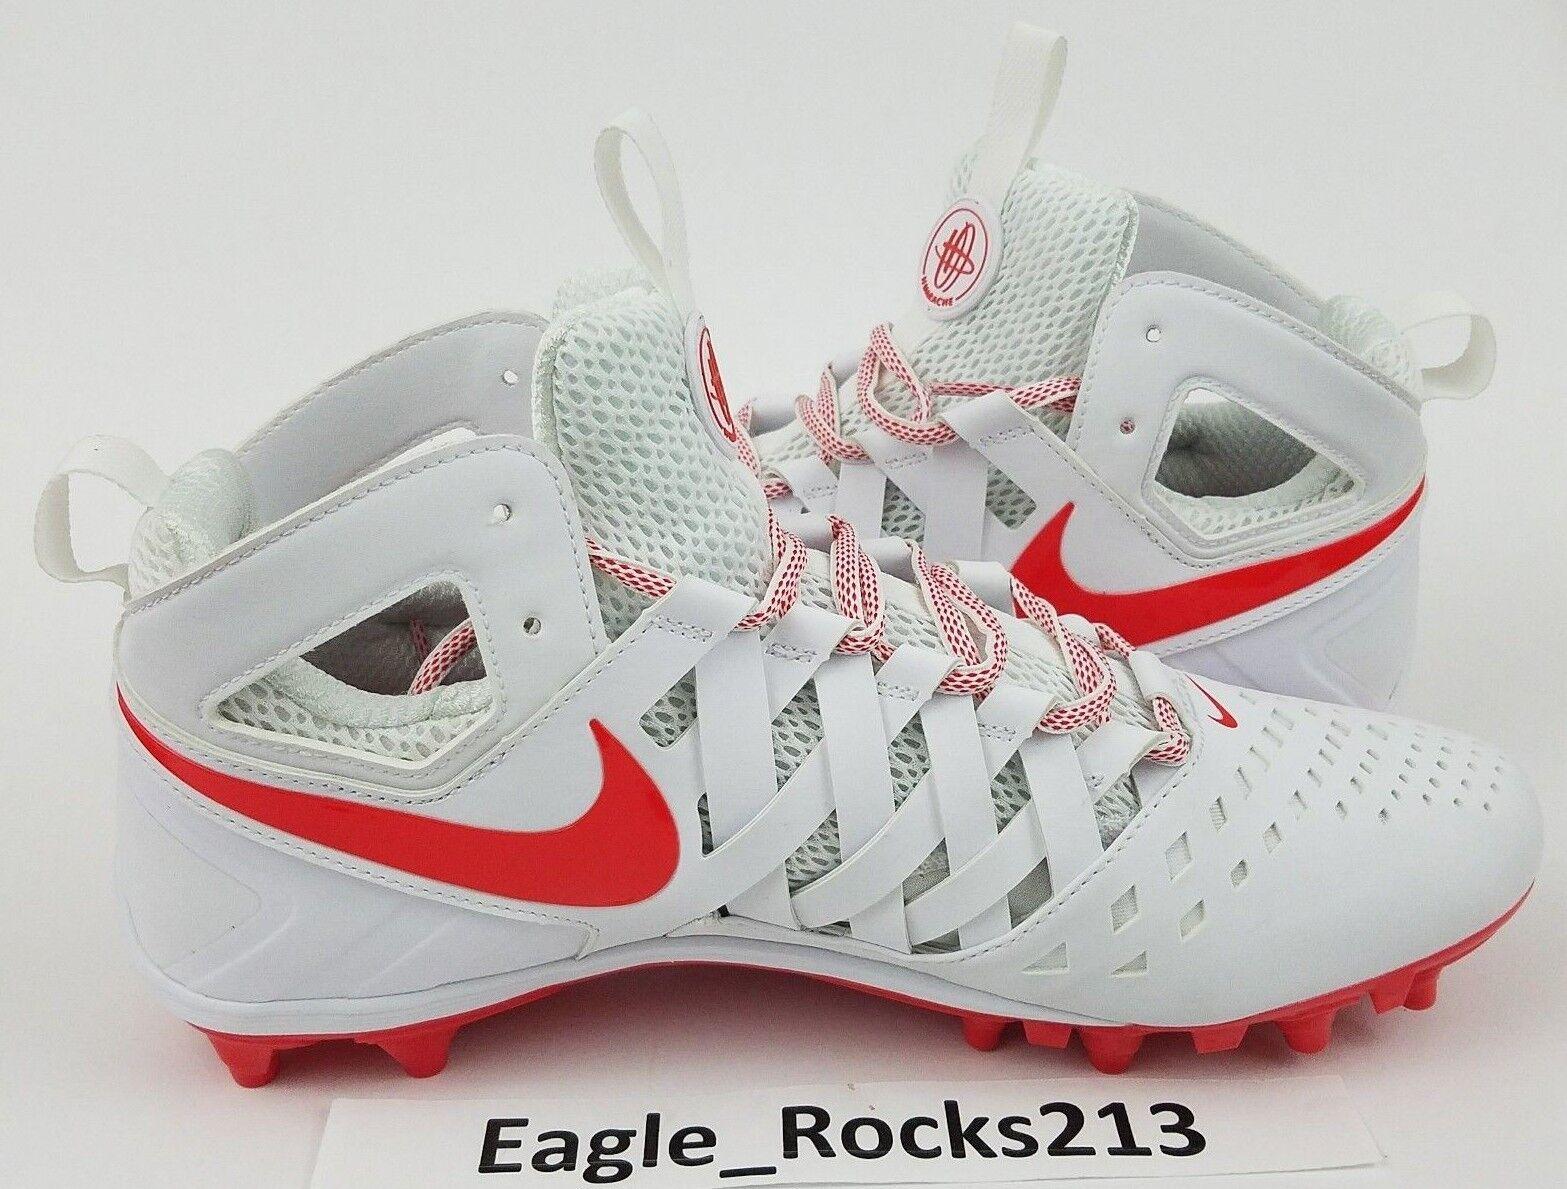 Nike Air Force 1 Utility VOLTWHITE US 6,5 39 Limited, neu no OFF WHITE SUPREME | eBay